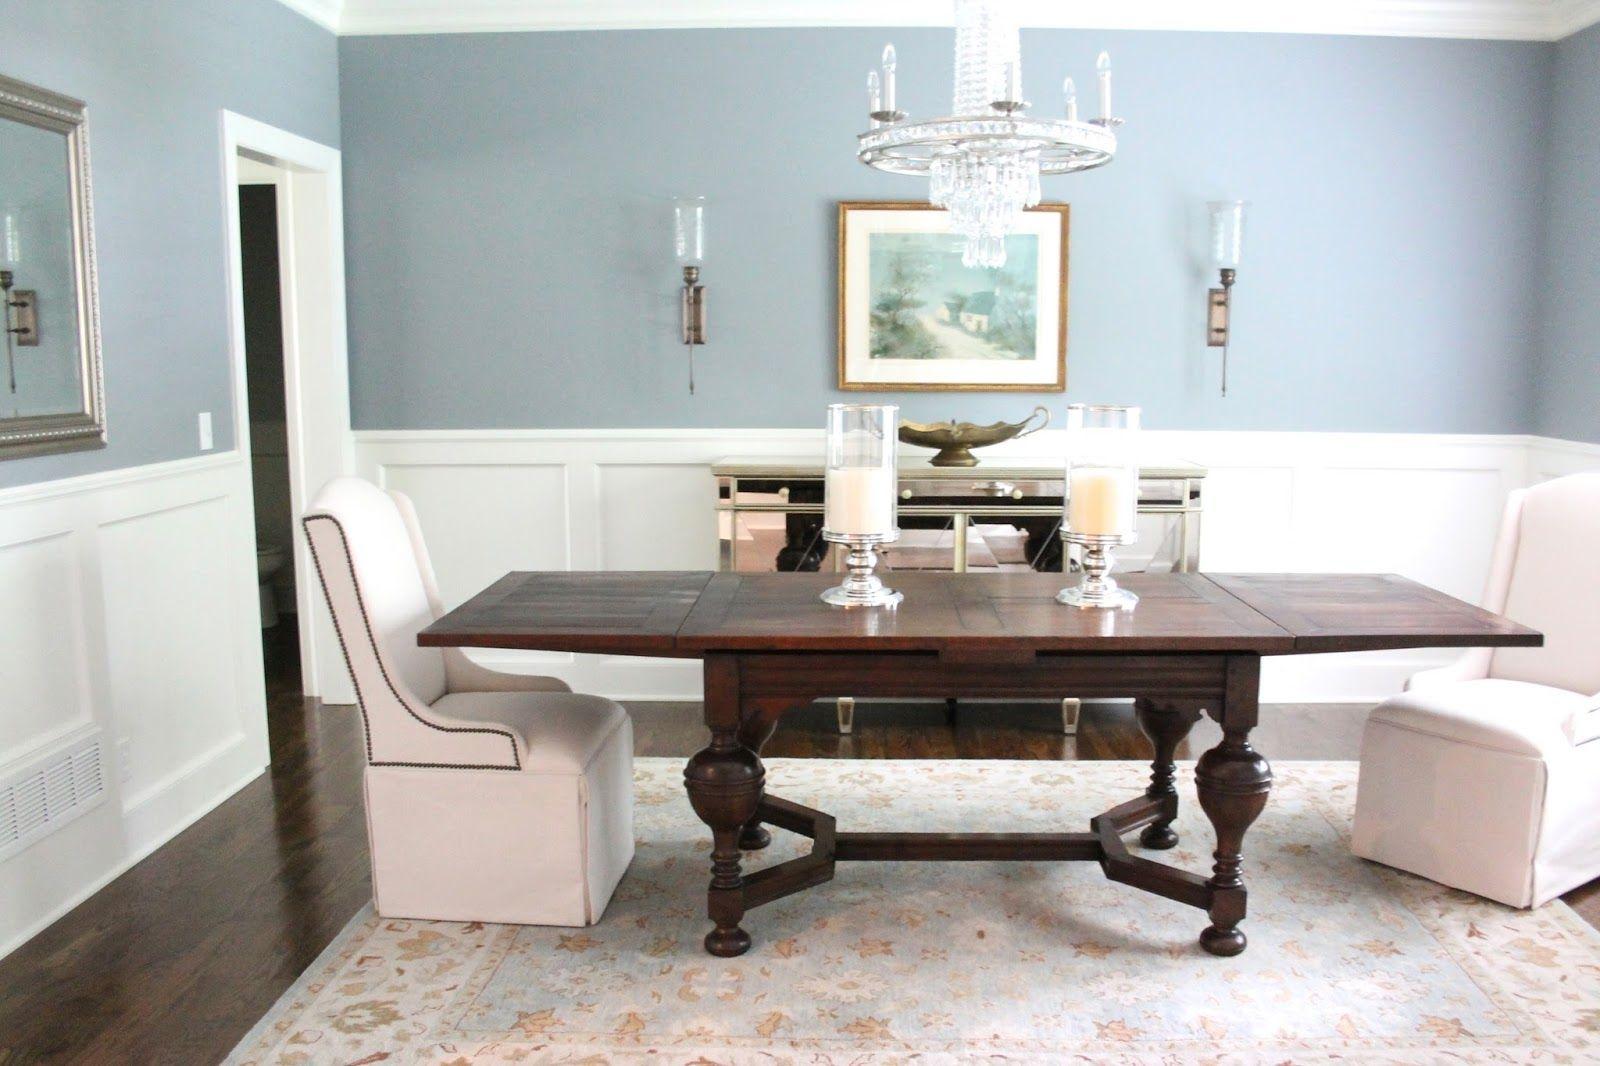 Image Result For Cape Cod Dining Room Design New Kitchen Inspiration Dining Room Design Home Decor